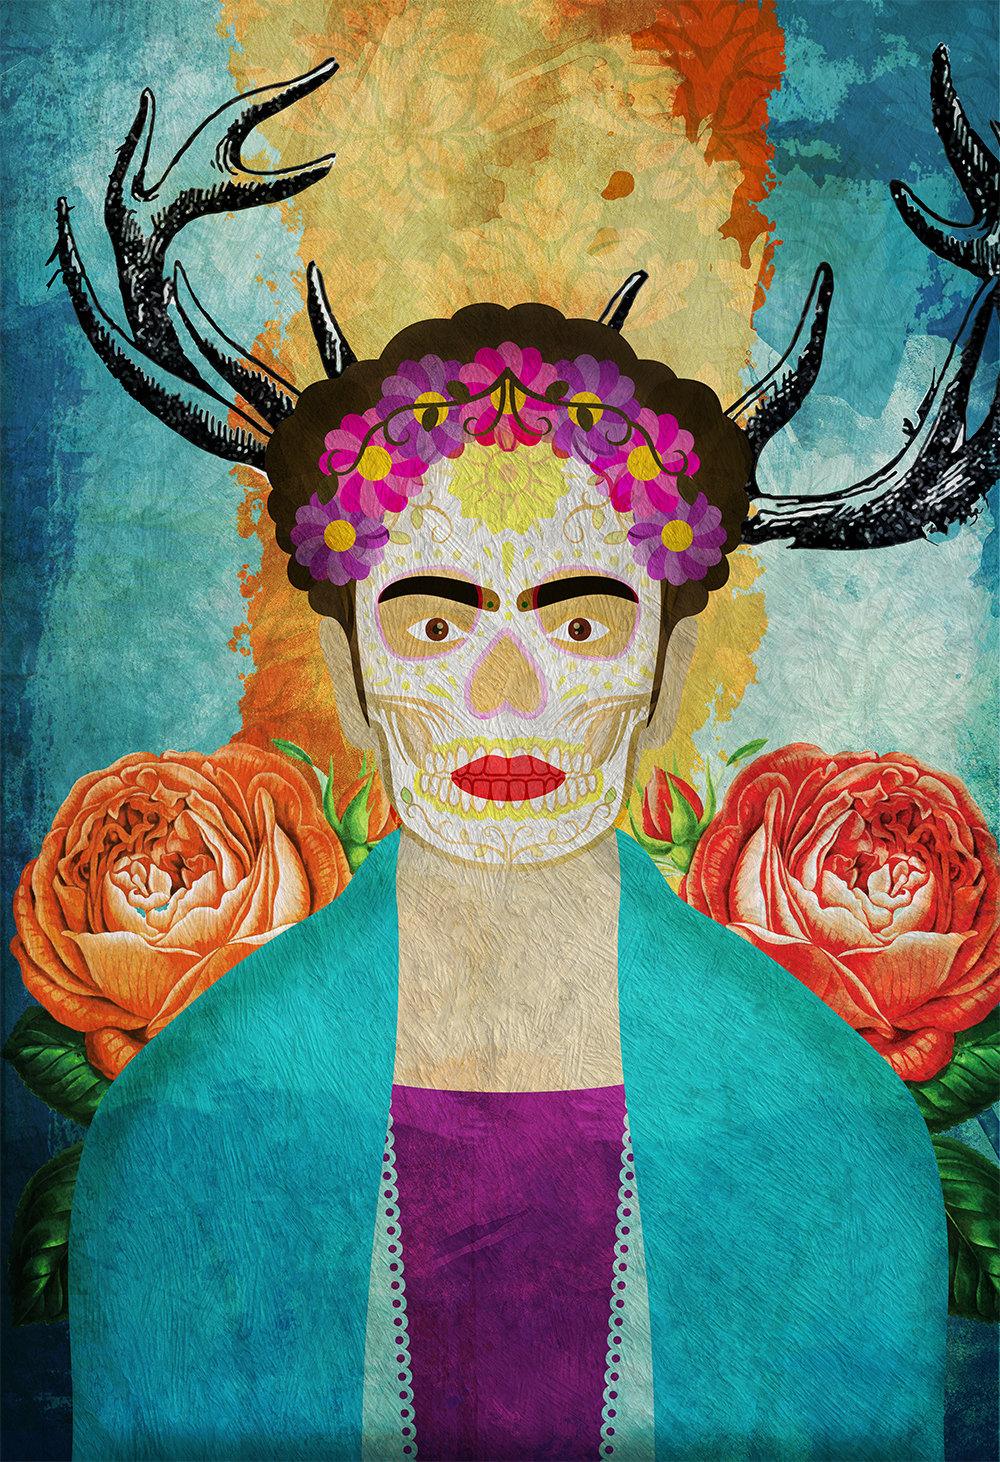 Frida Kahlo Mexican Retro Portrait Illustration Art Print